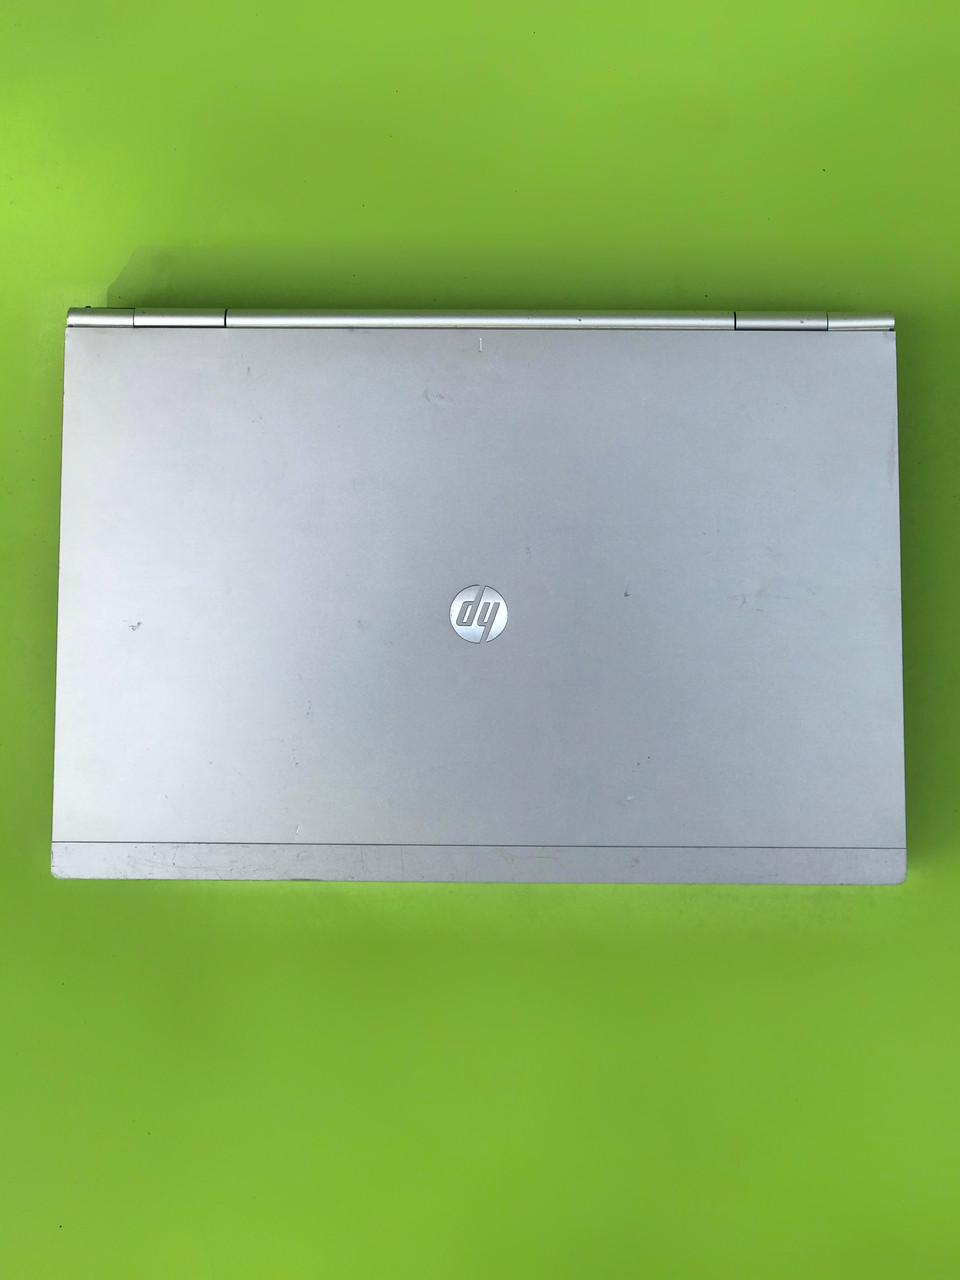 Отличный ноутбук дома и офиса/HP ElitBook/Core i3/4GB/320GB